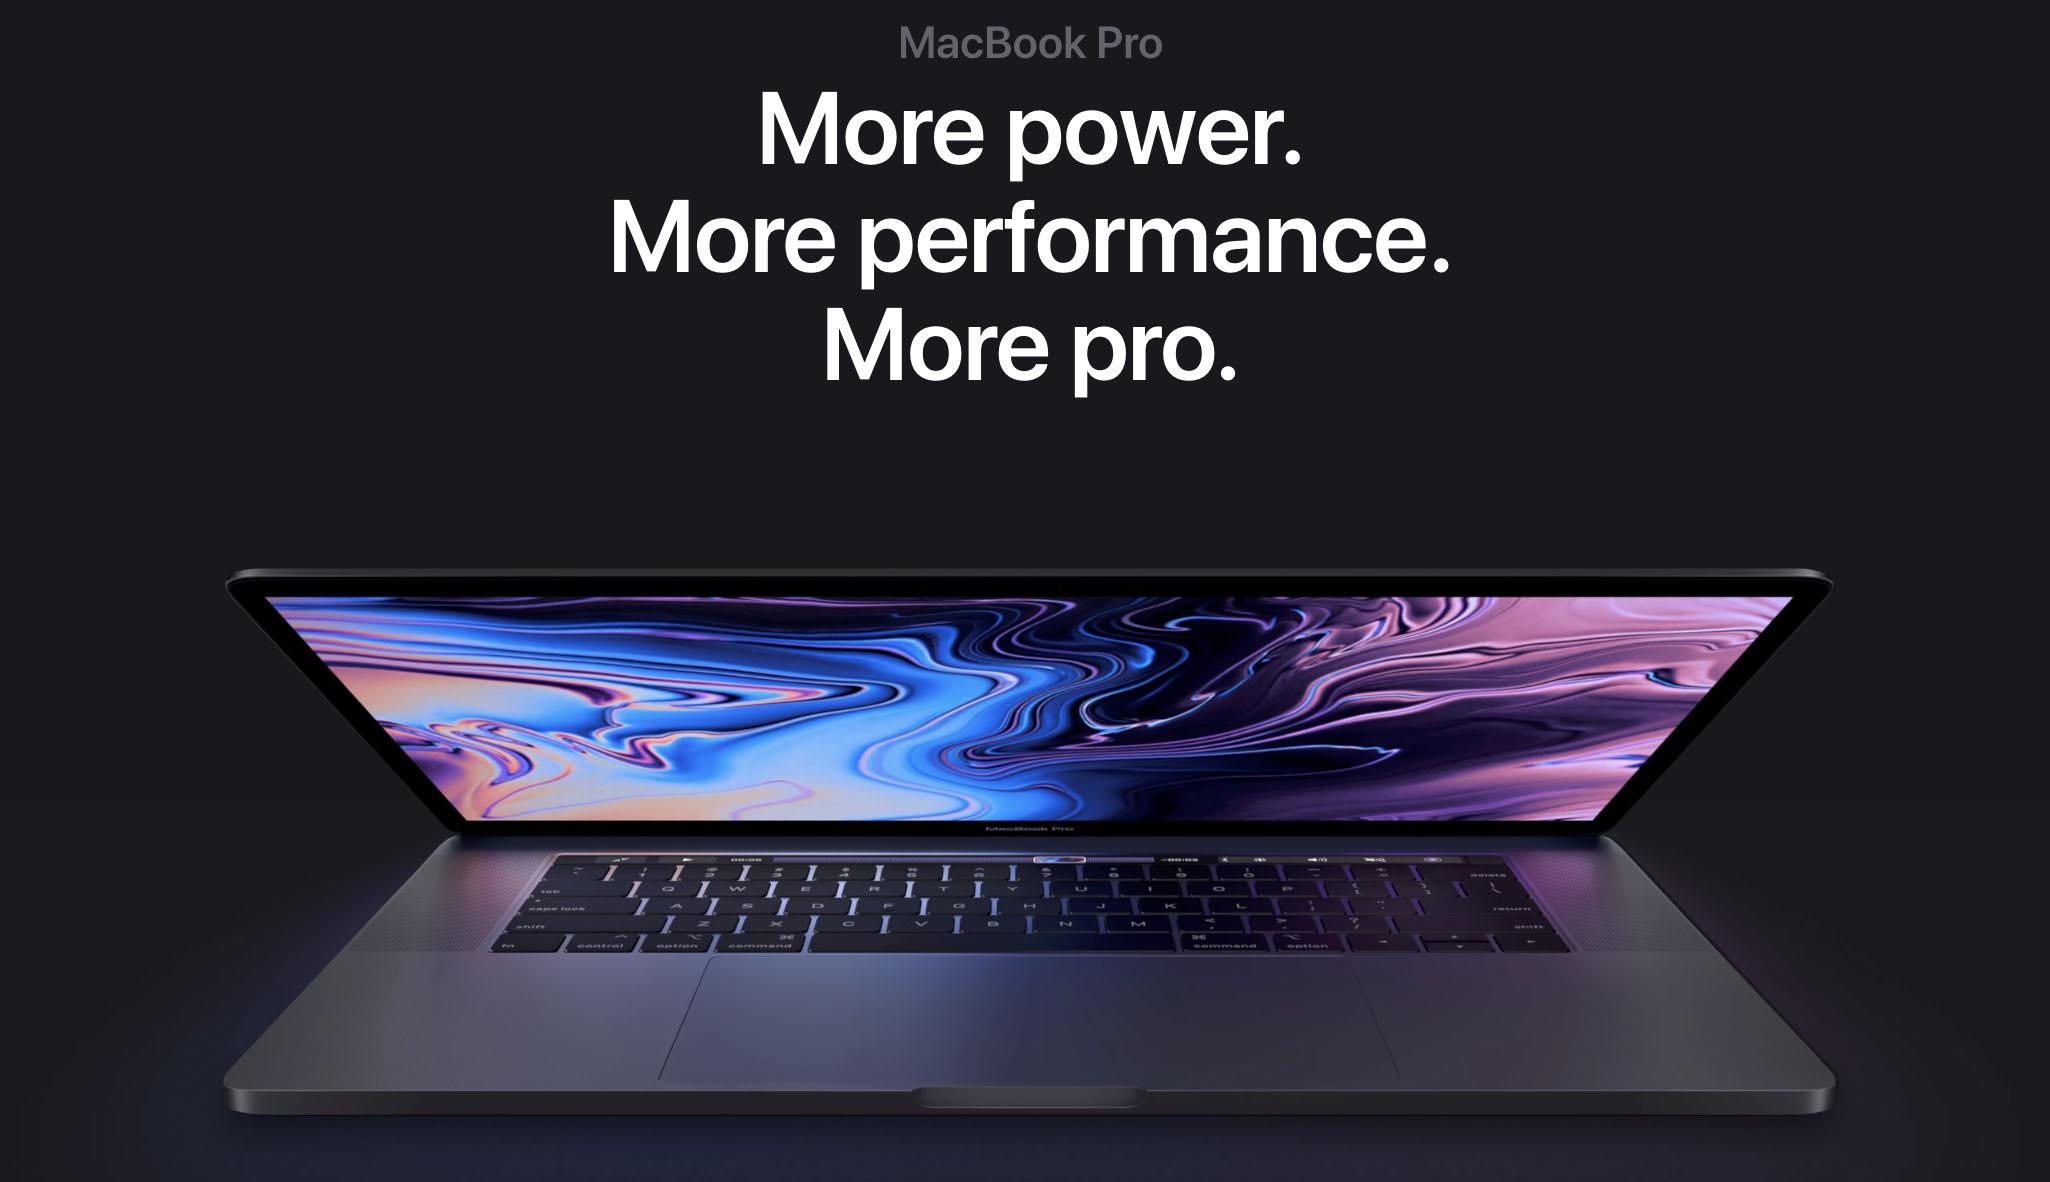 Hashtag Trending - New MacBook Pro, Walmart patents spy tech; Twitter bio tips